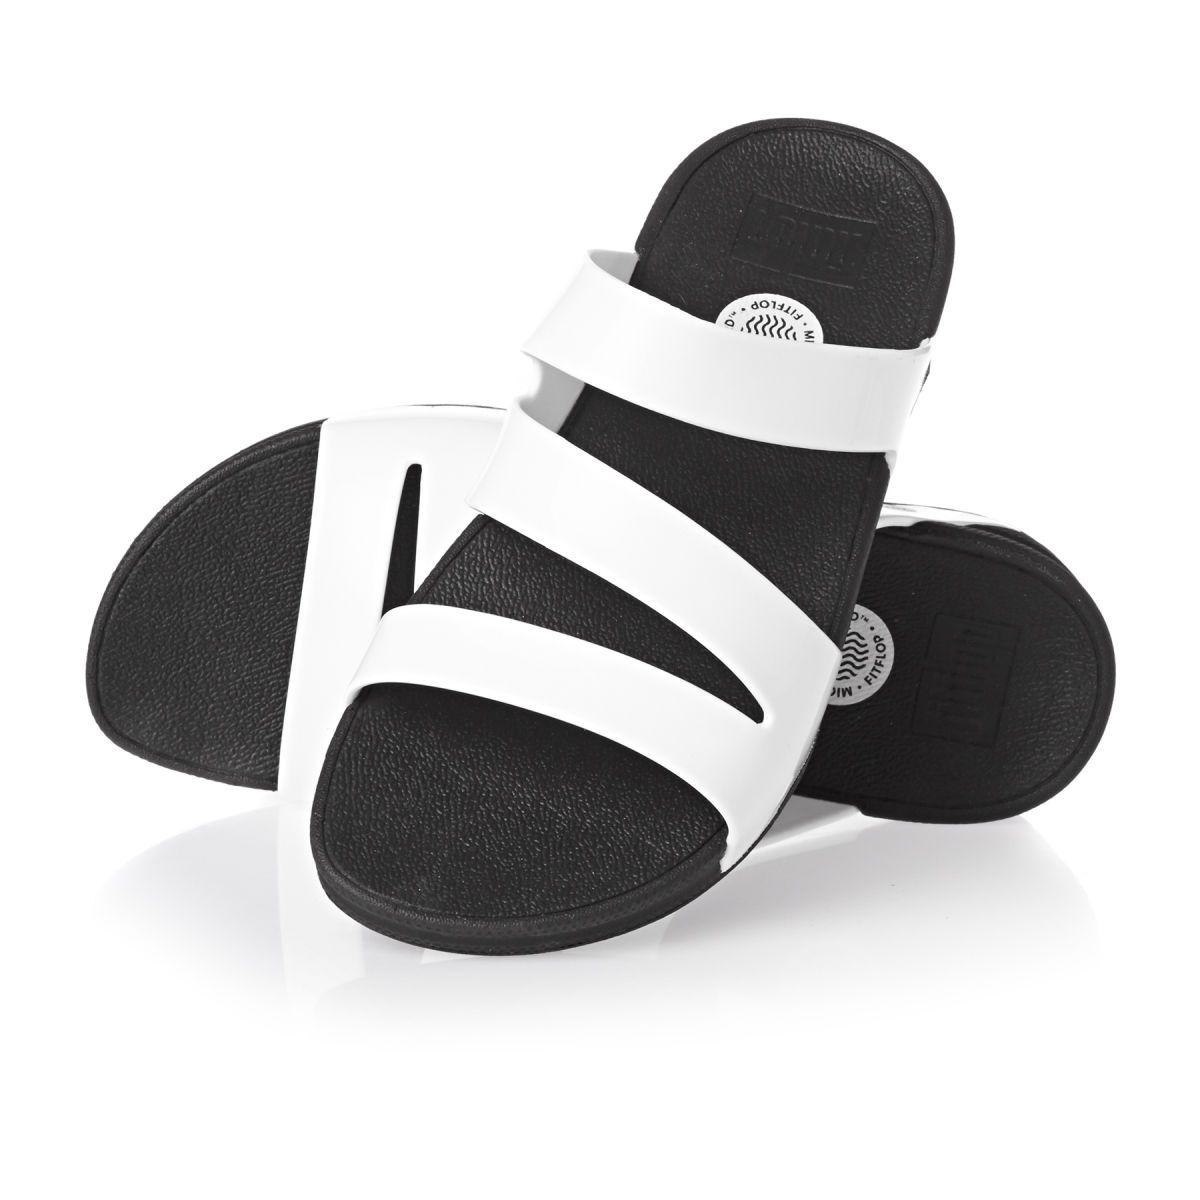 8560d75a3d0b Fitflop Superjelly Twist Flip Flops - Urban White